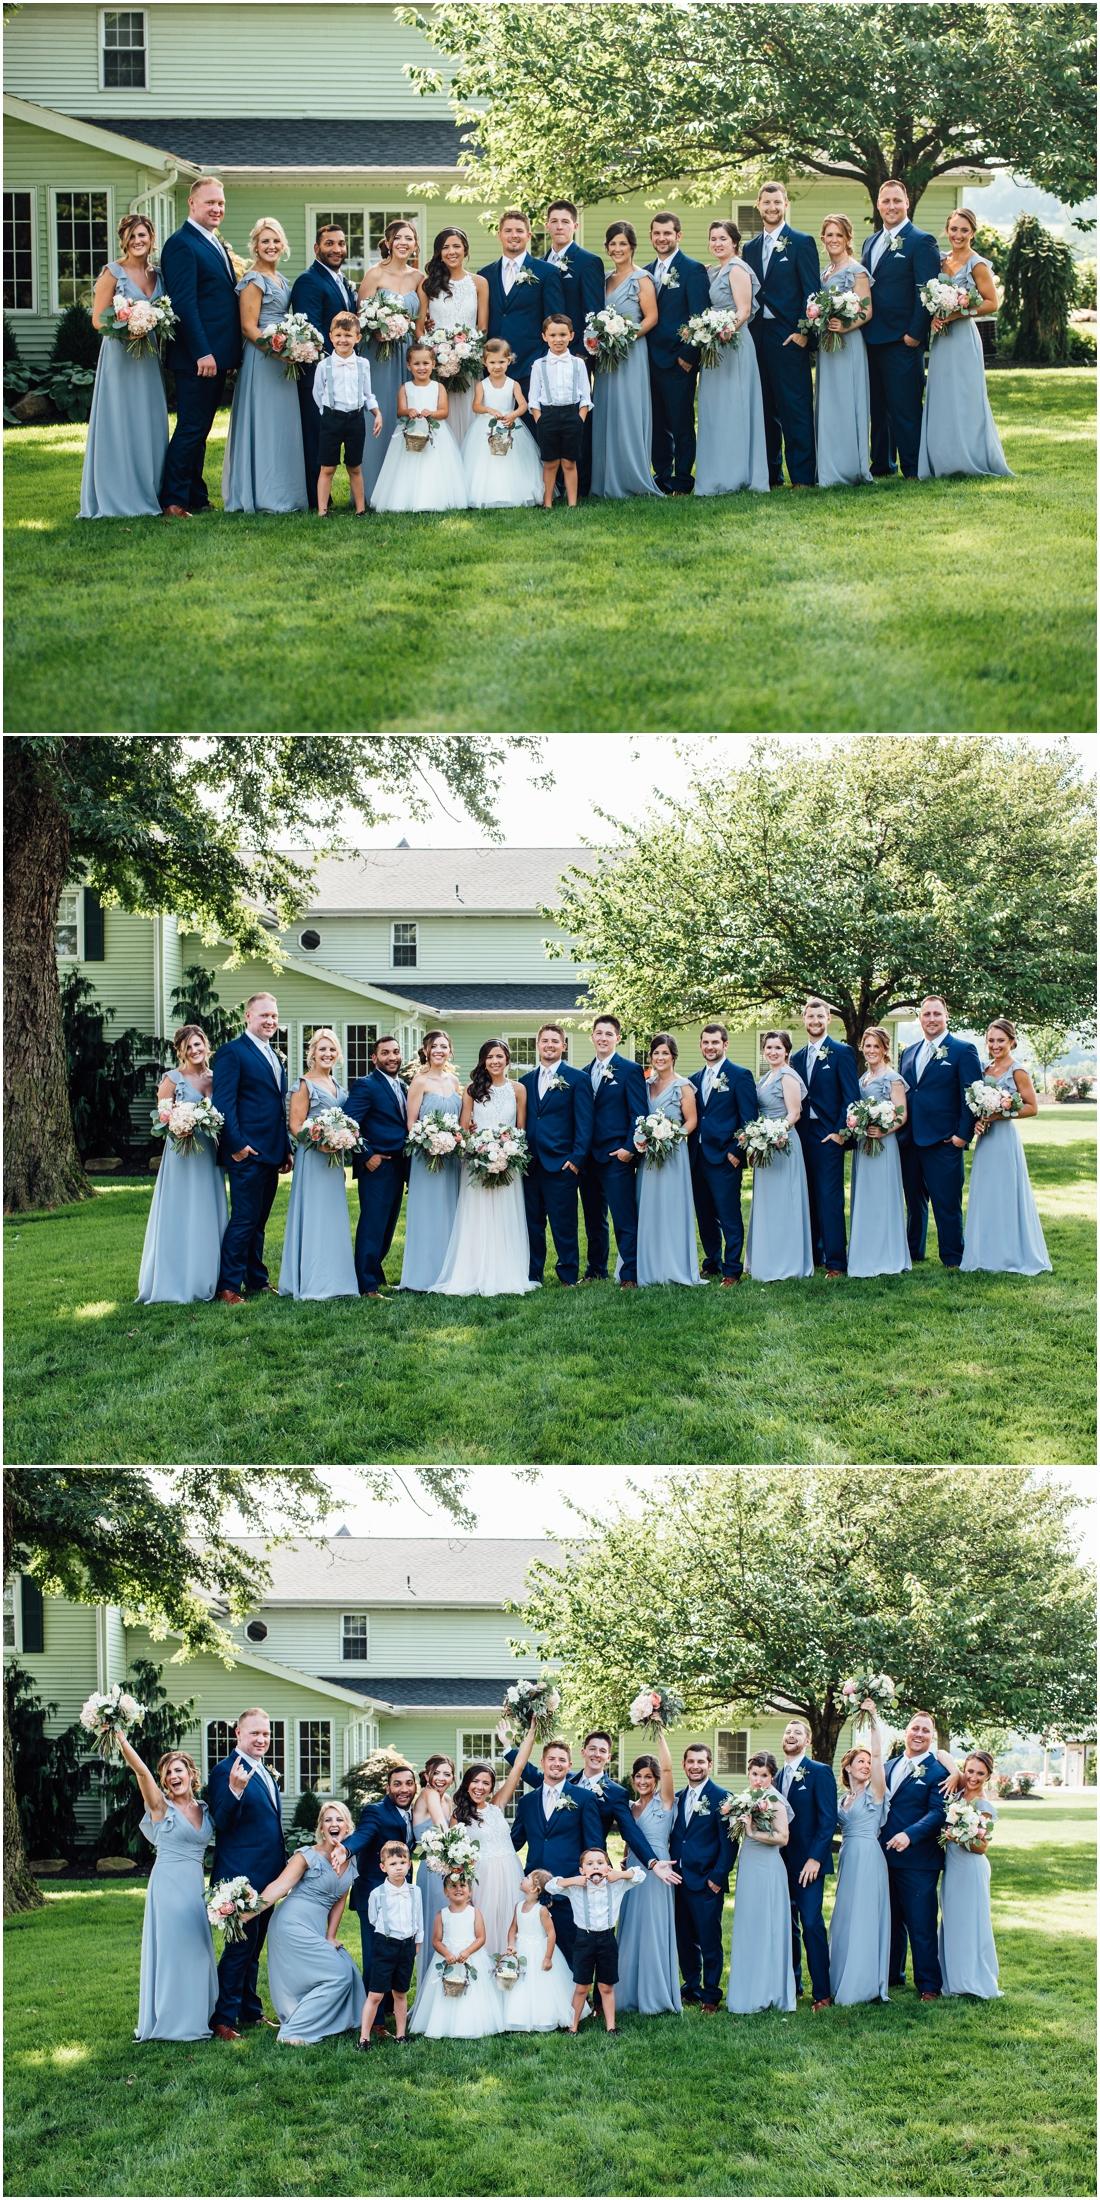 Steph&Bryan_Lancaster_wedding_farm_0526.jpg